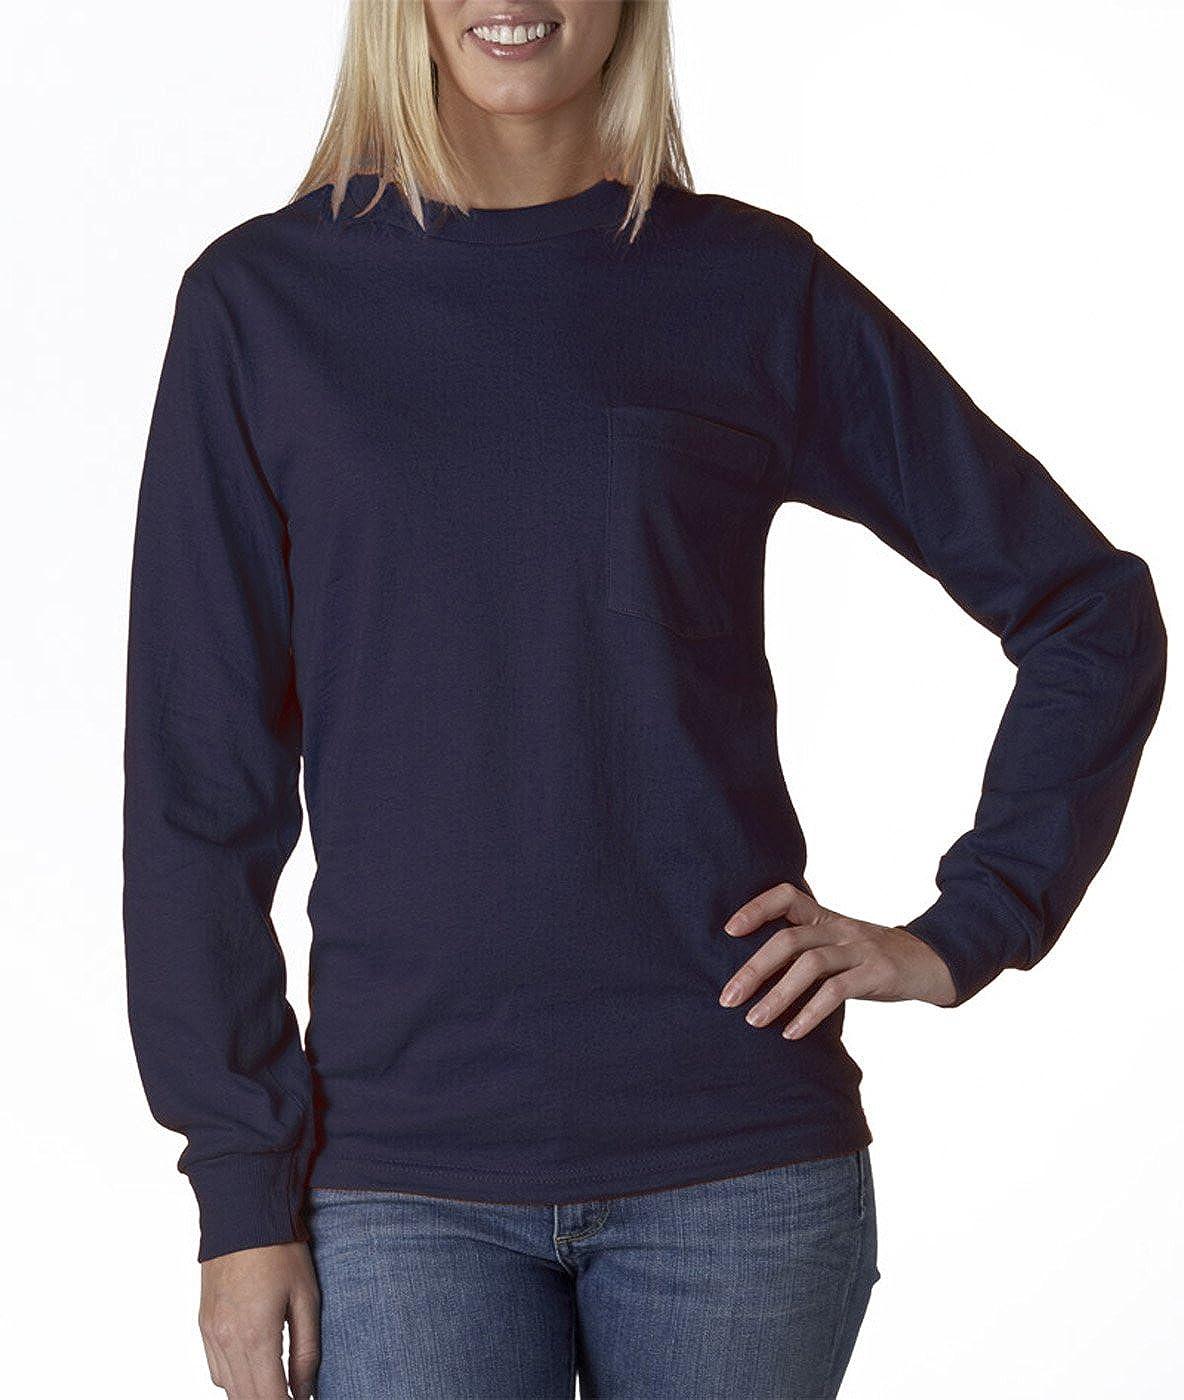 Long-Sleeve Pocket T-Shirt Gildan Ultra Cotton 6 oz